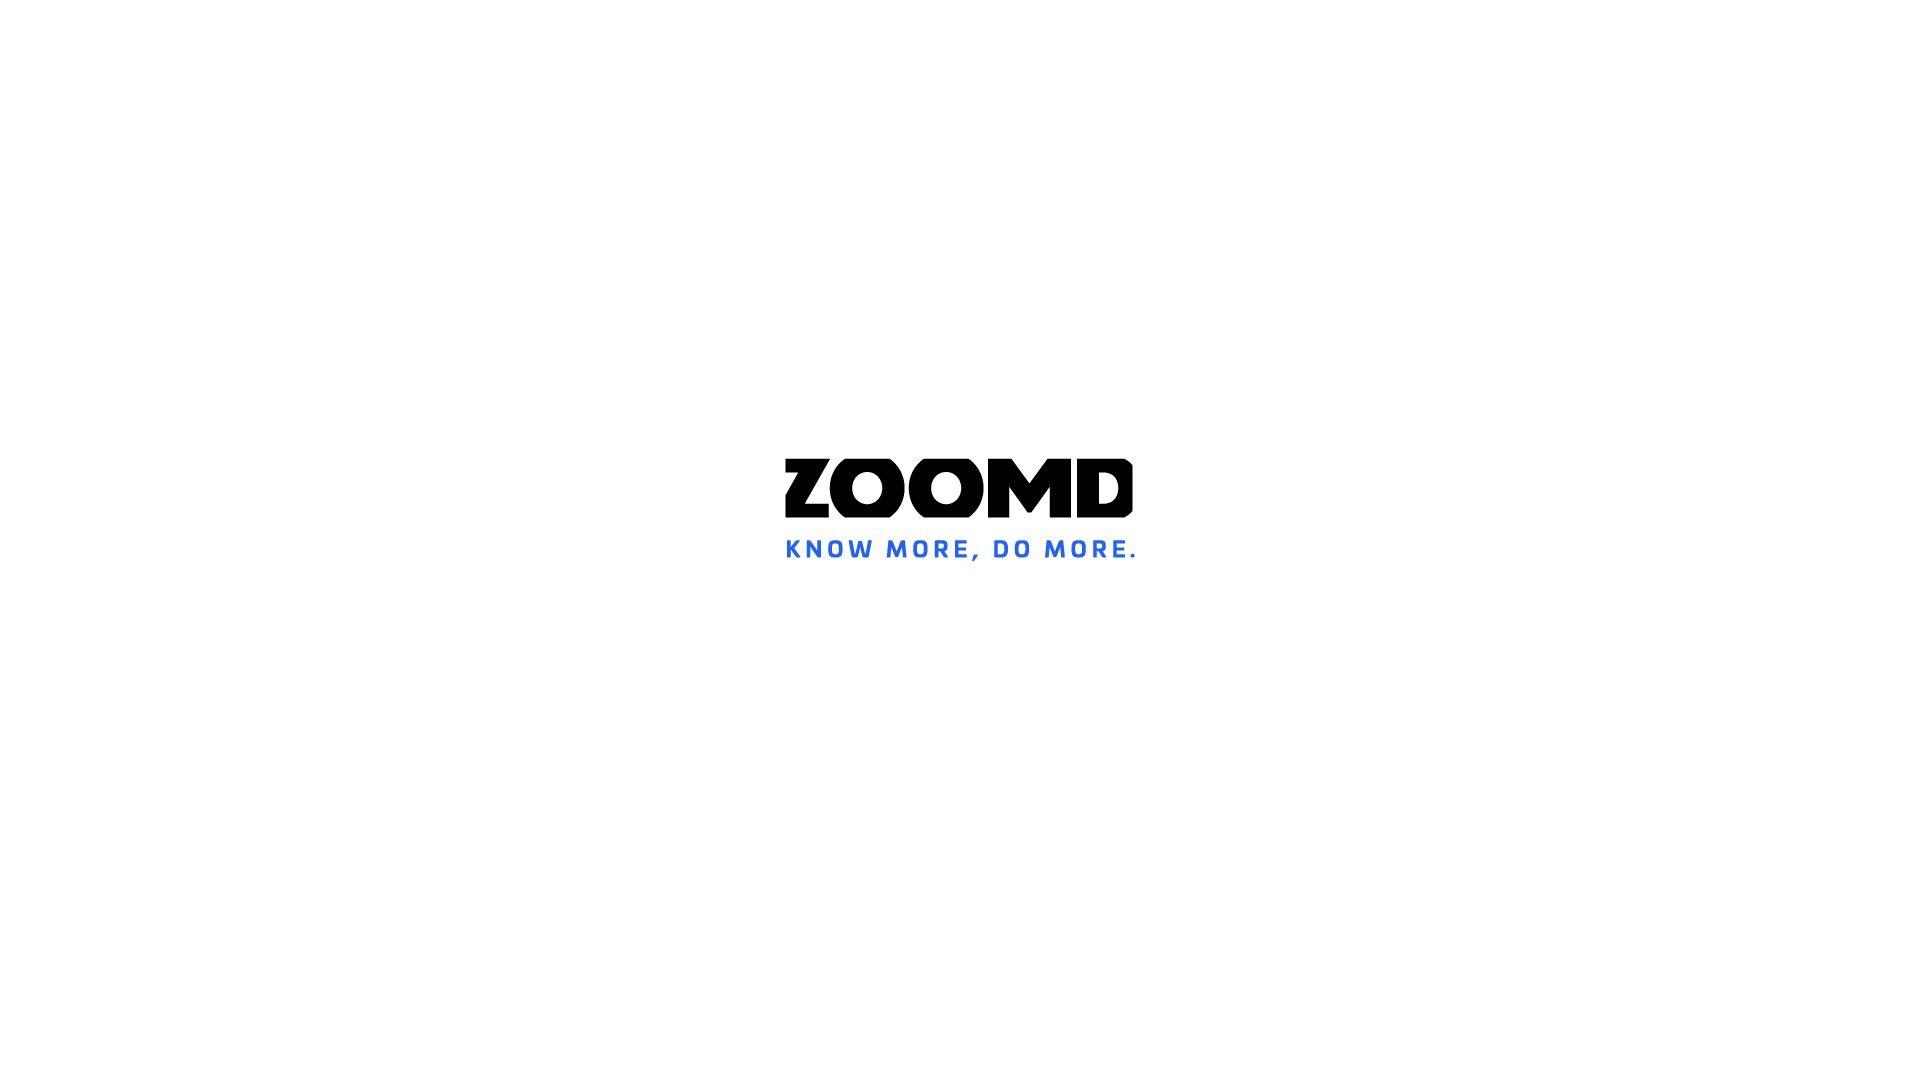 Foto de Zoomd